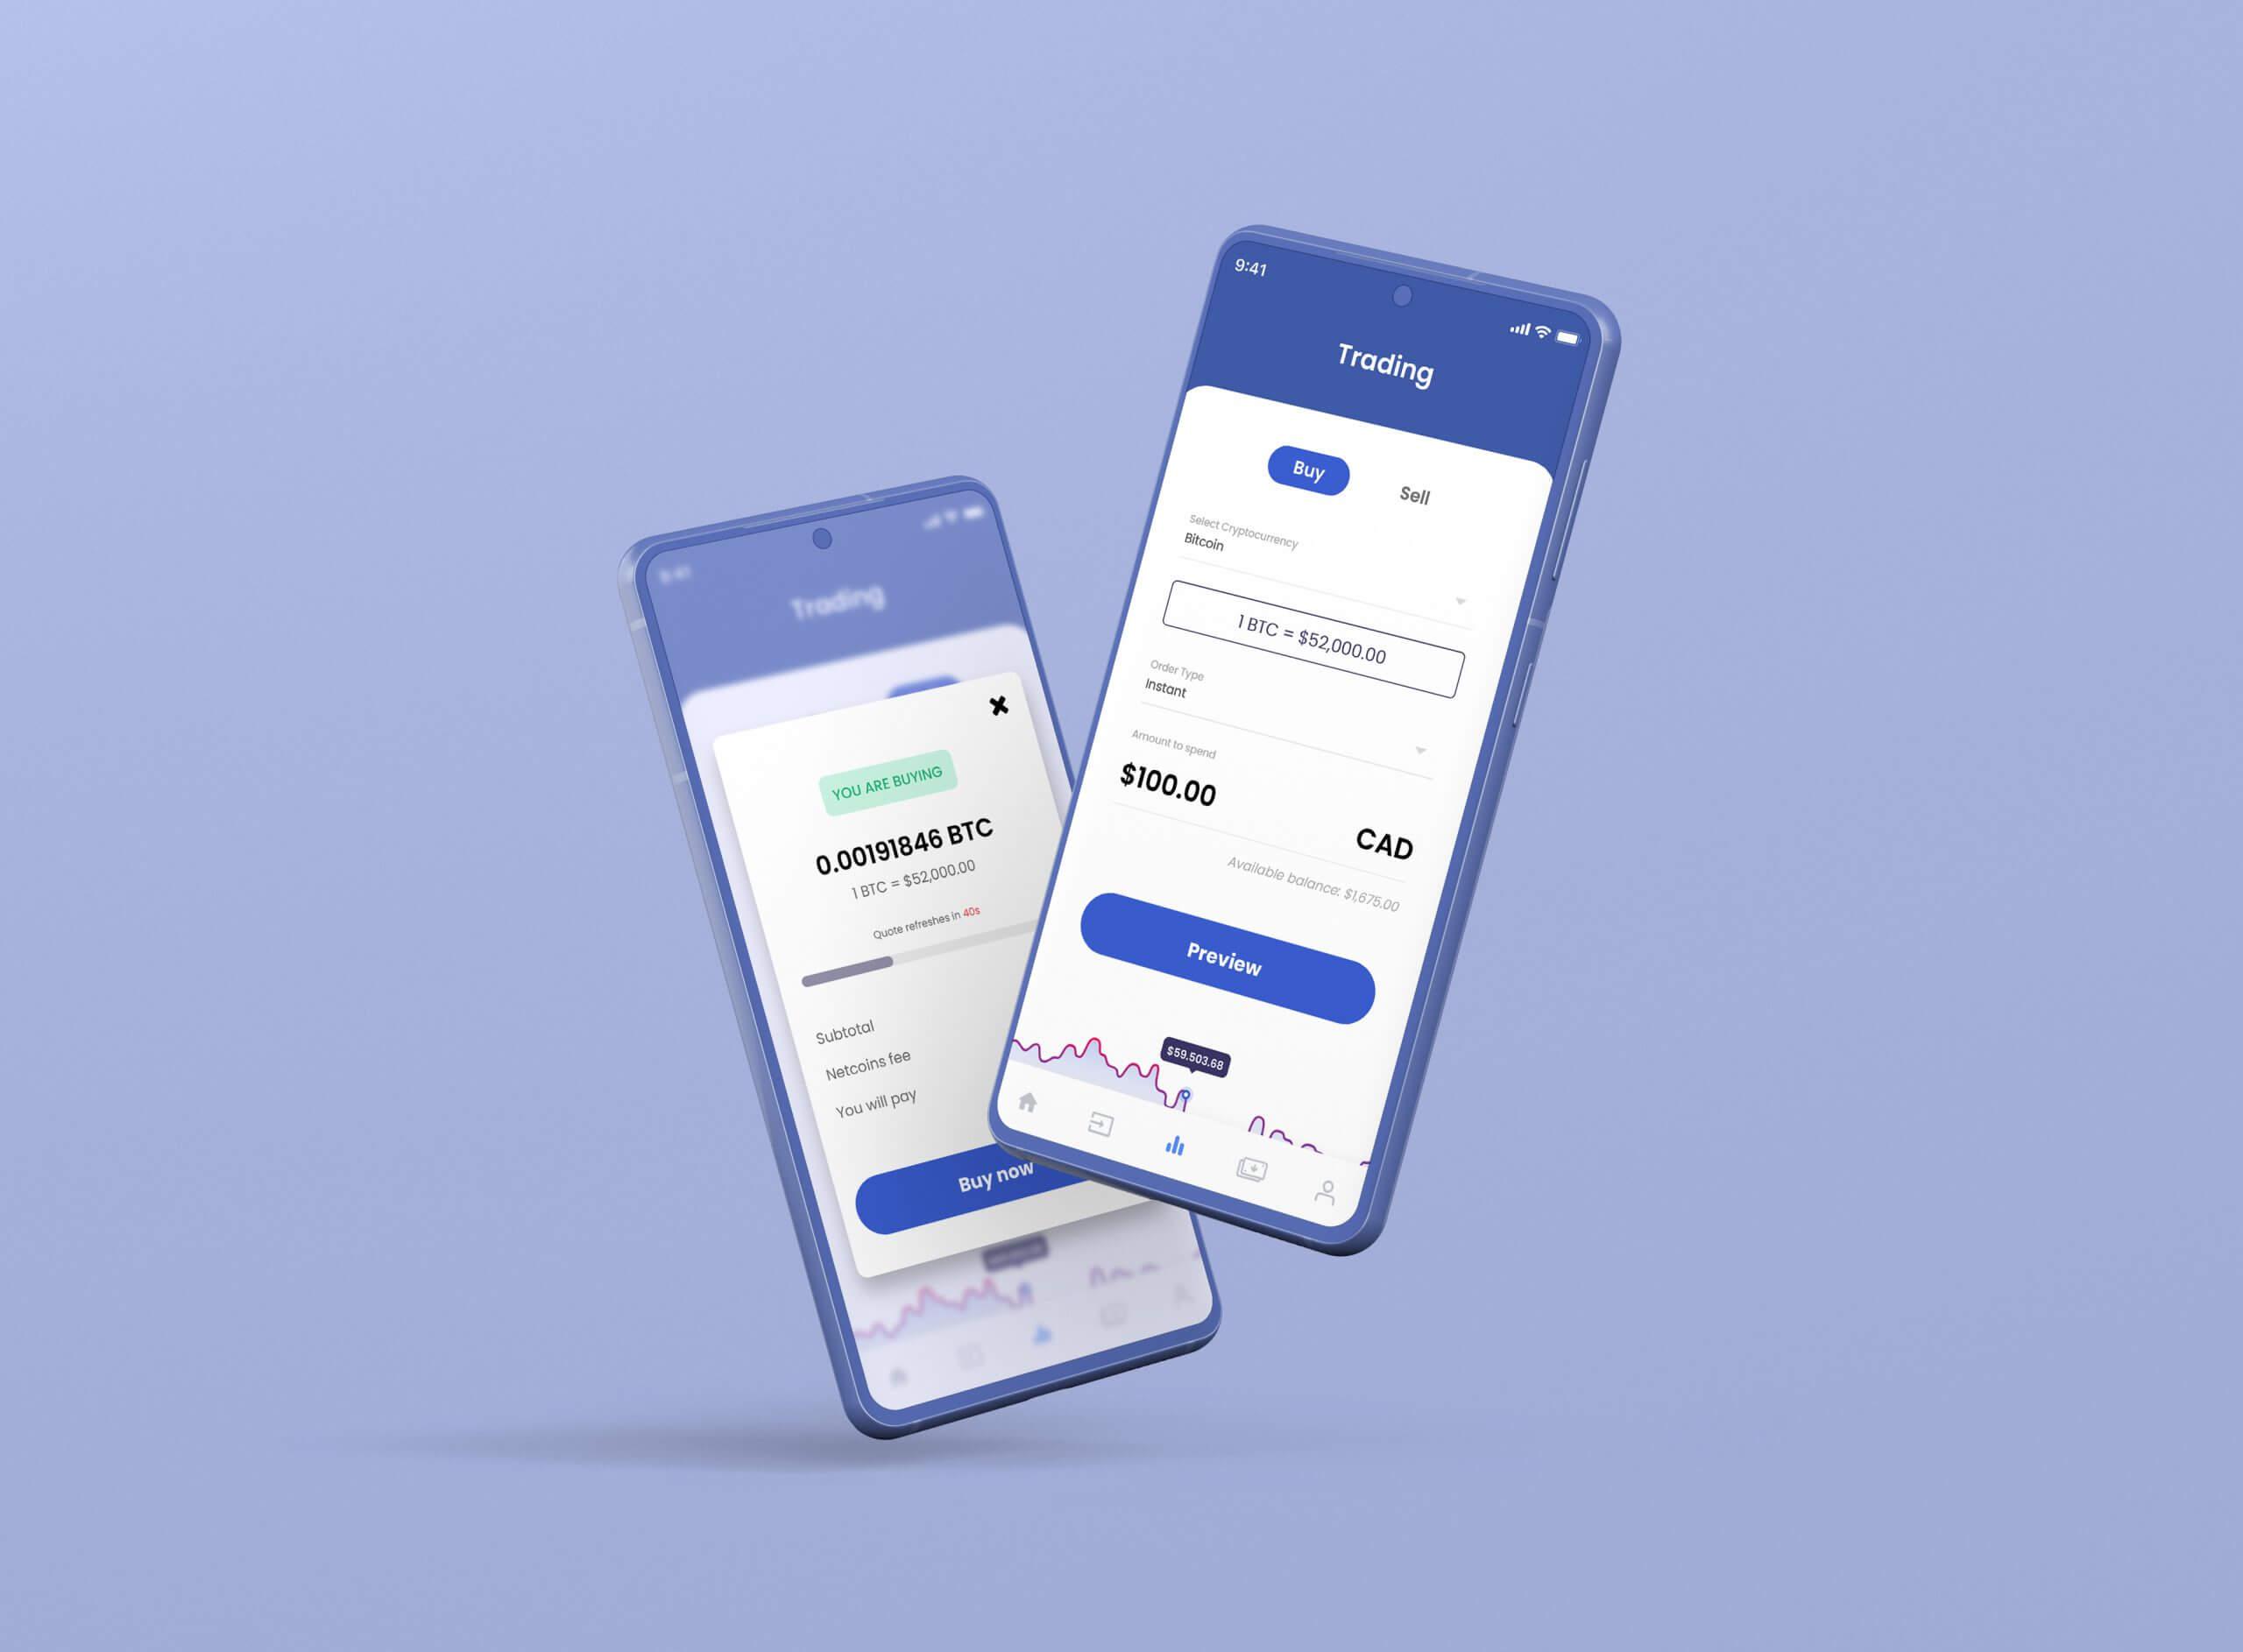 Netcoins Mobile App - Trading